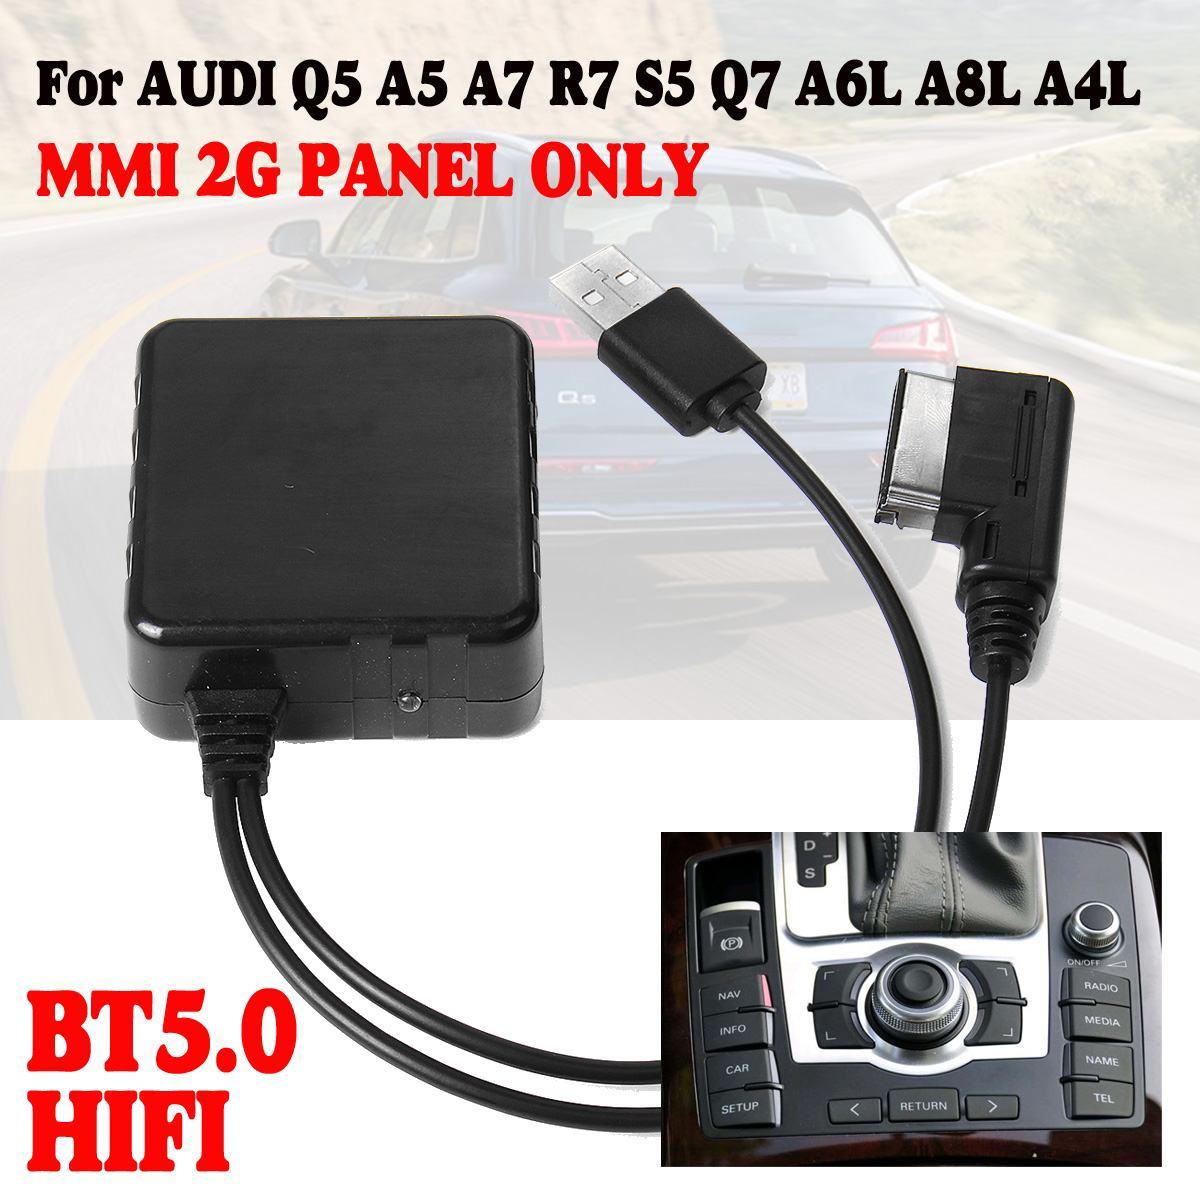 12V MMI 2G Voiture bluetooth Câble Adaptateur Sans Fil Pour AUDI Q5 A5 A7 R7 S5 Q7 A6L A8L A4L